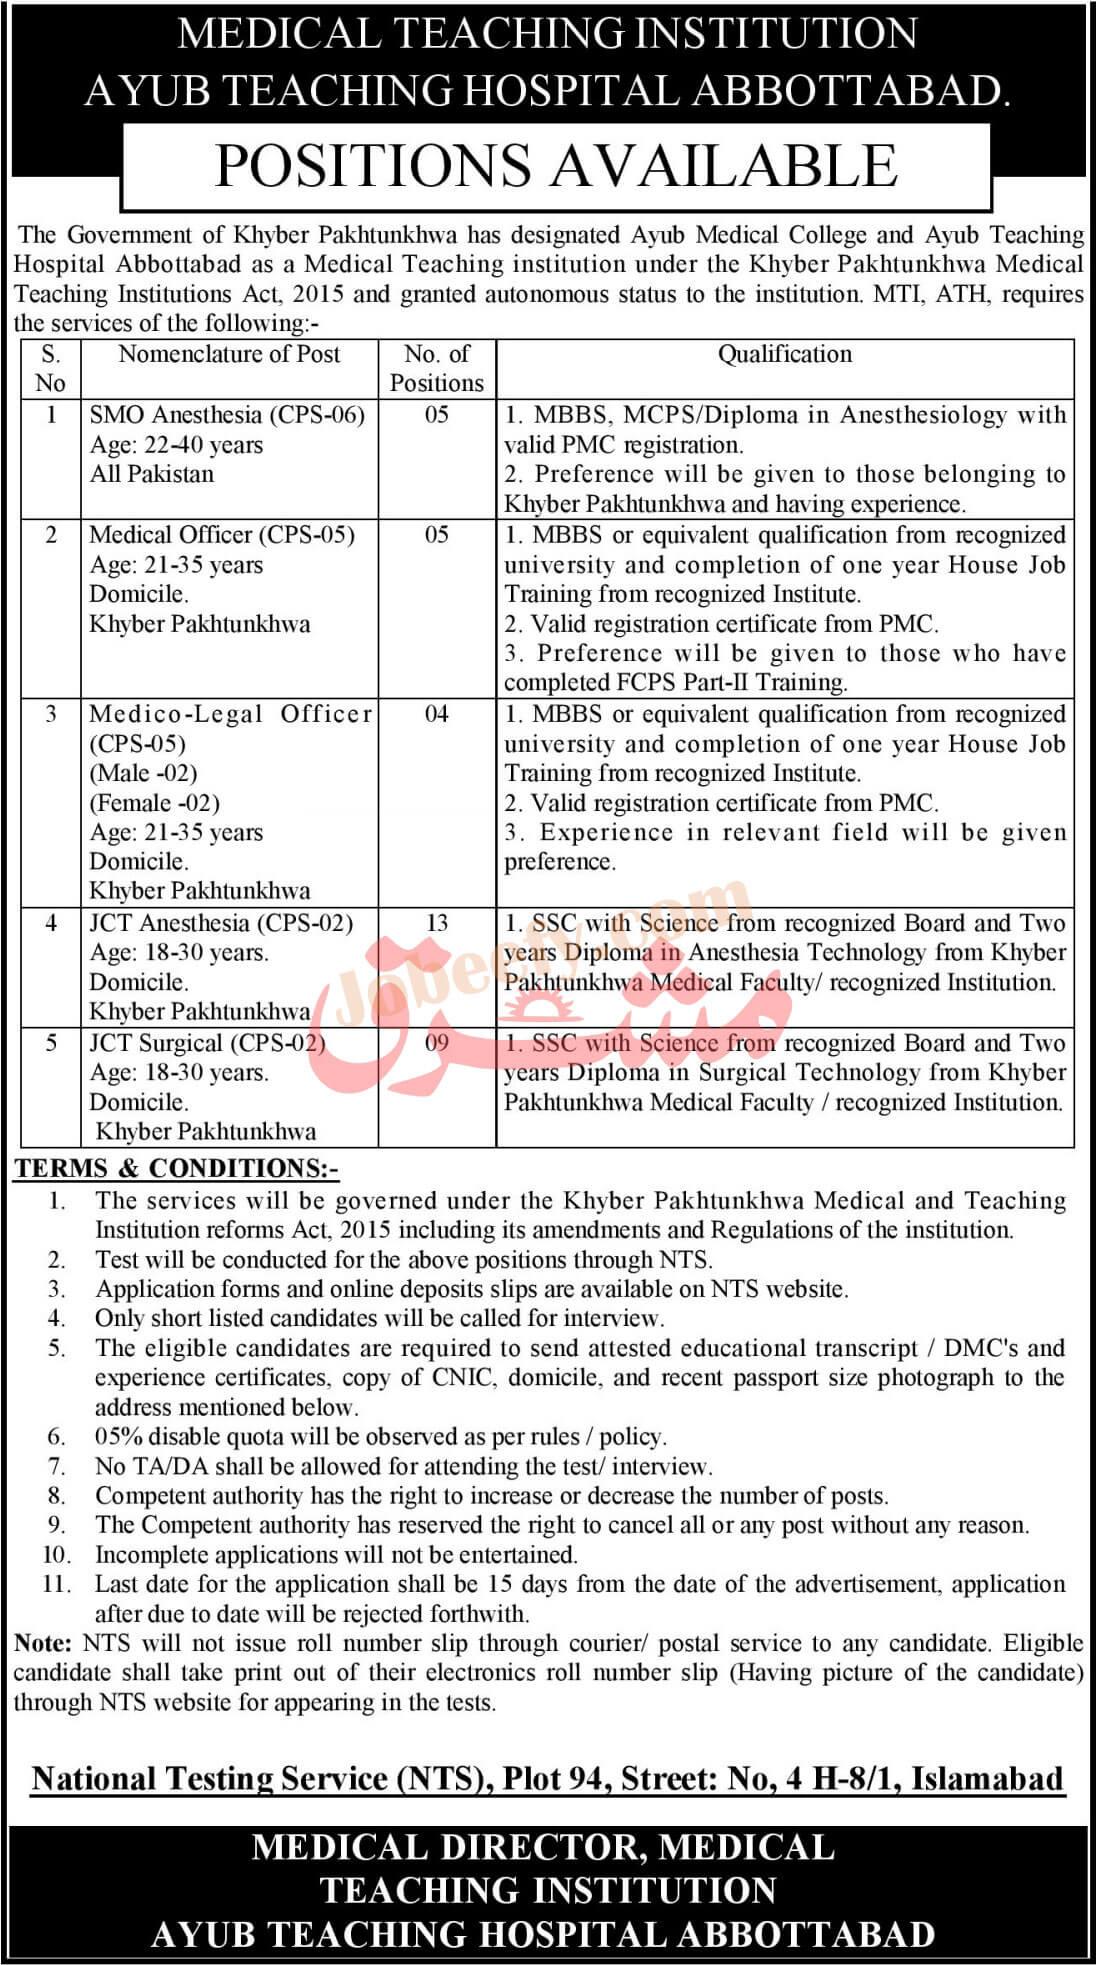 Abbottabad Ayub Teaching Hospital (ATH) Jobs 2021 Via NTS